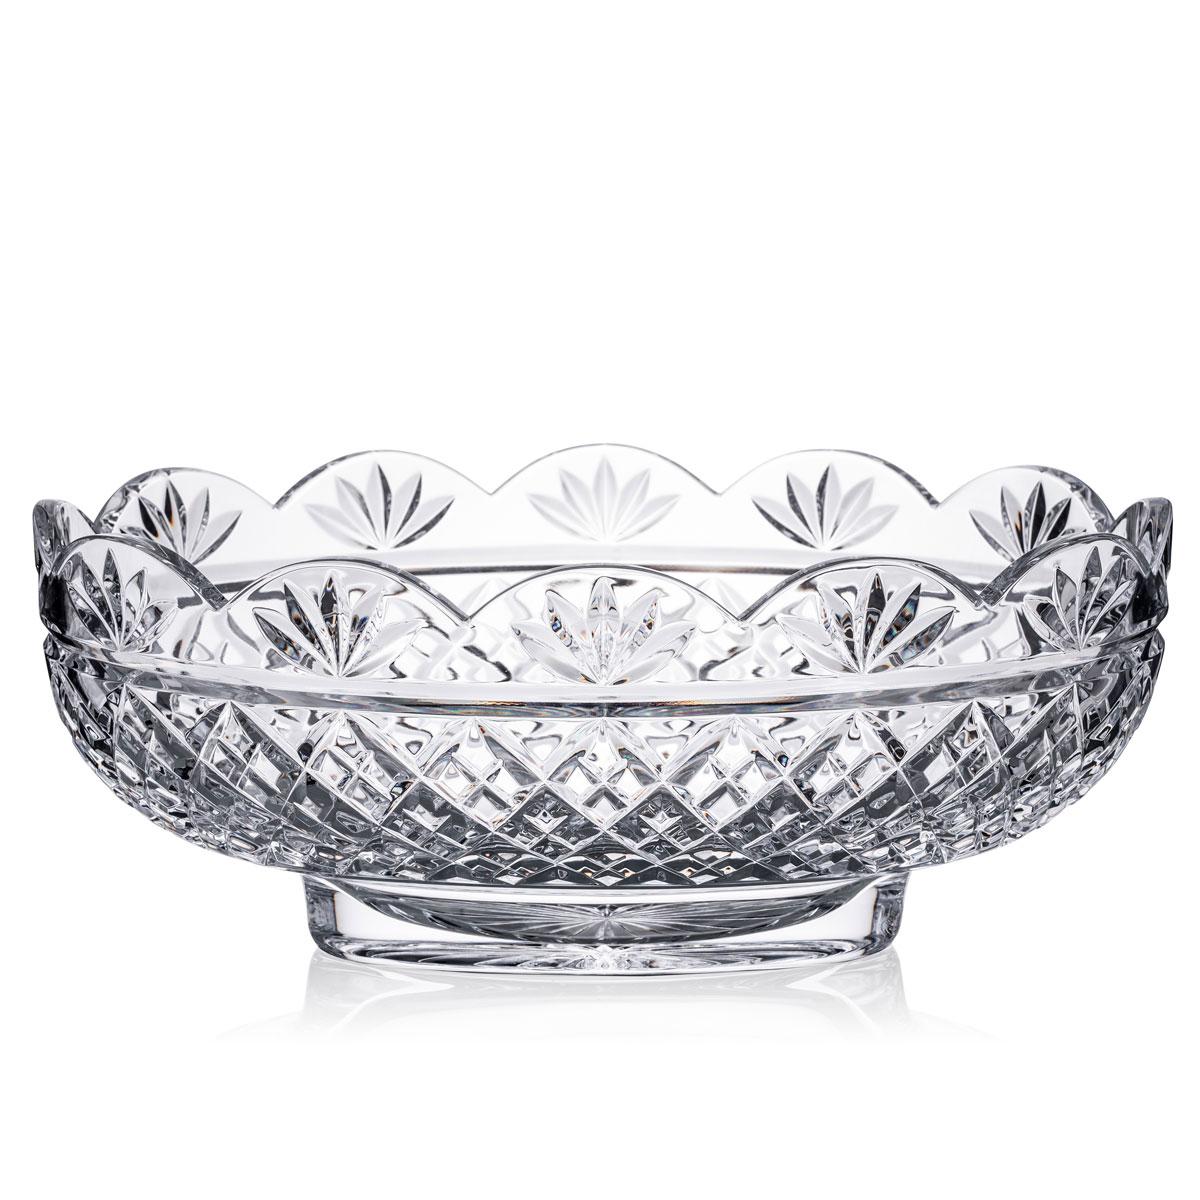 "Waterford Crystal Irish Treasures Oval 11"" Bowl"